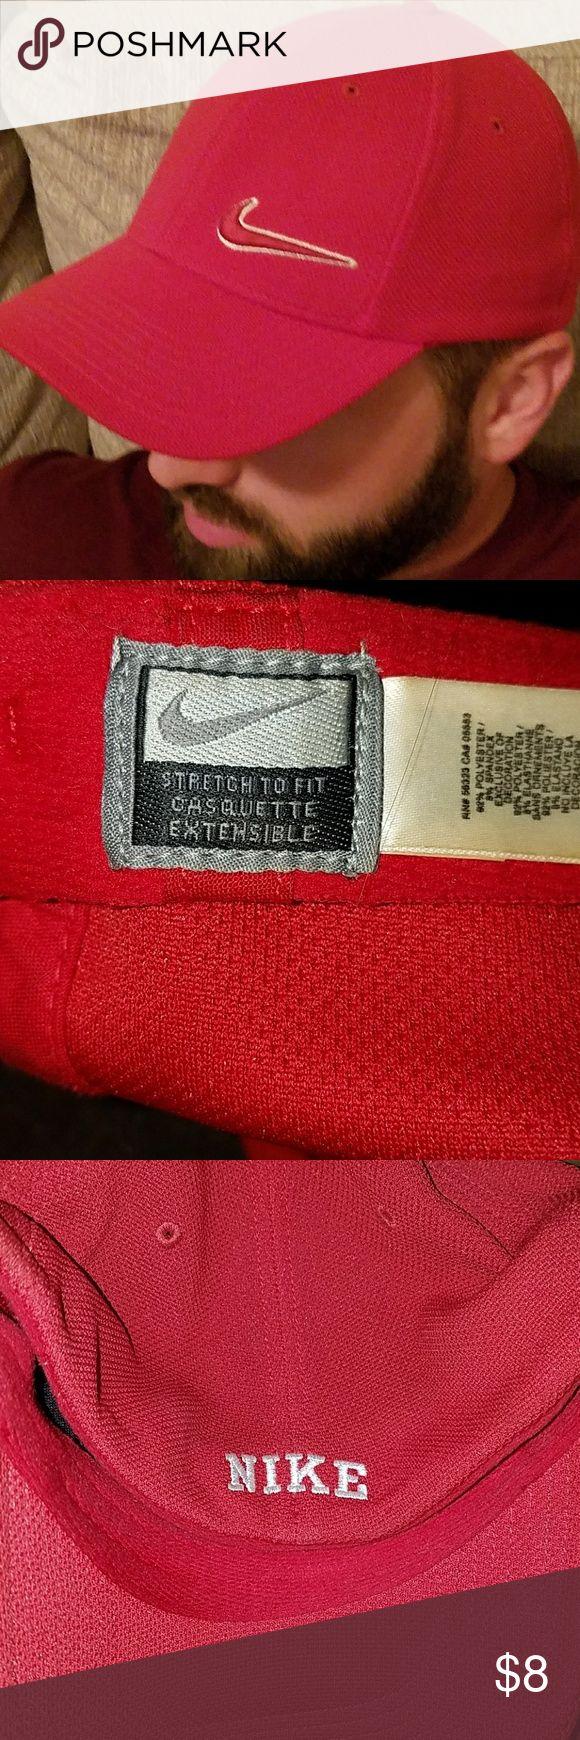 Nike Hat Men's Red Nike Hat L/XL Accessories Hats